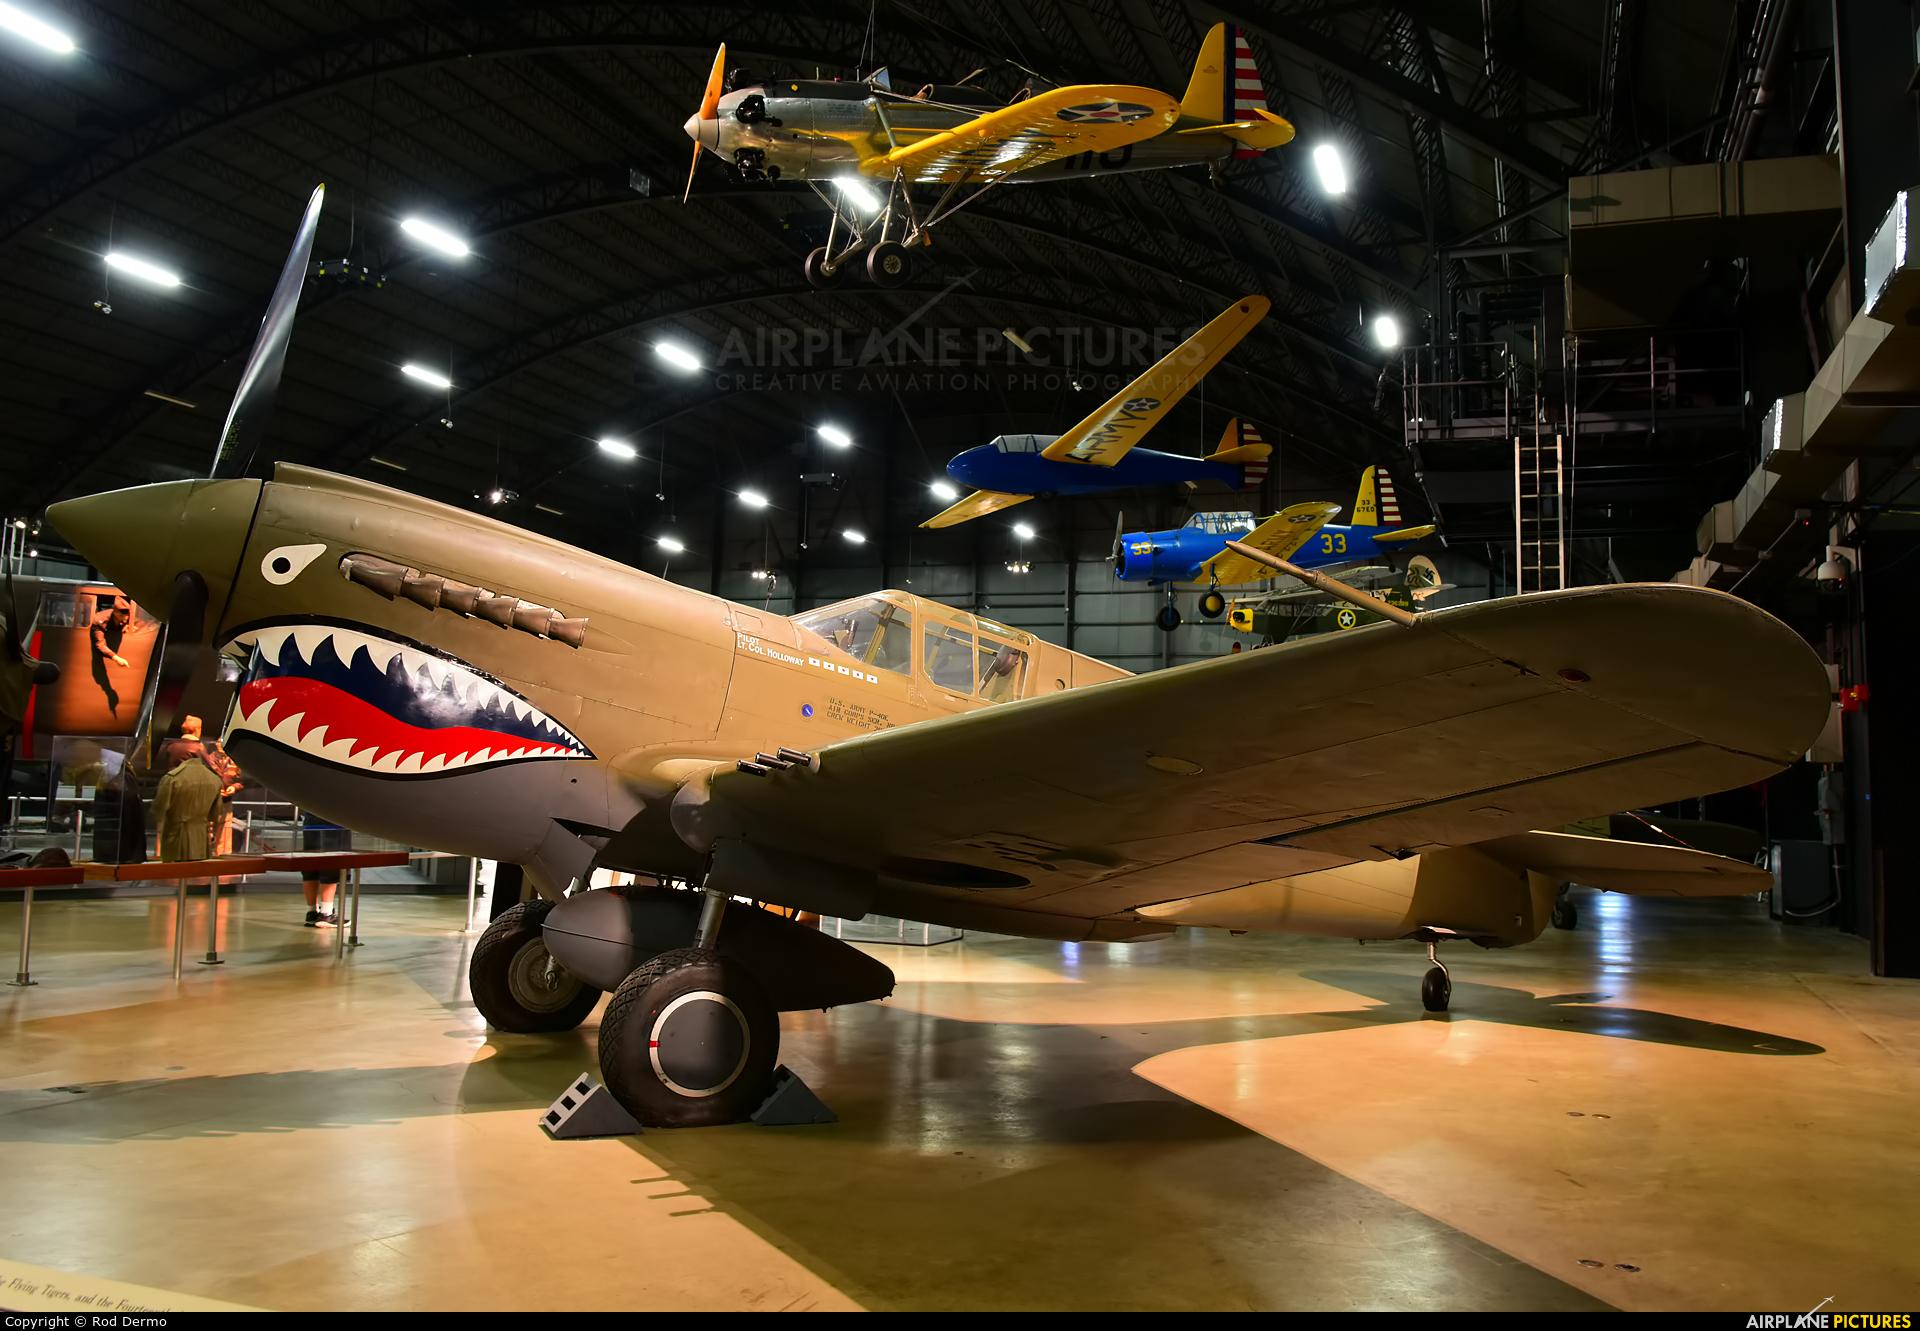 USA - Army 42-65406 aircraft at Dayton - Wright-Patterson AFB